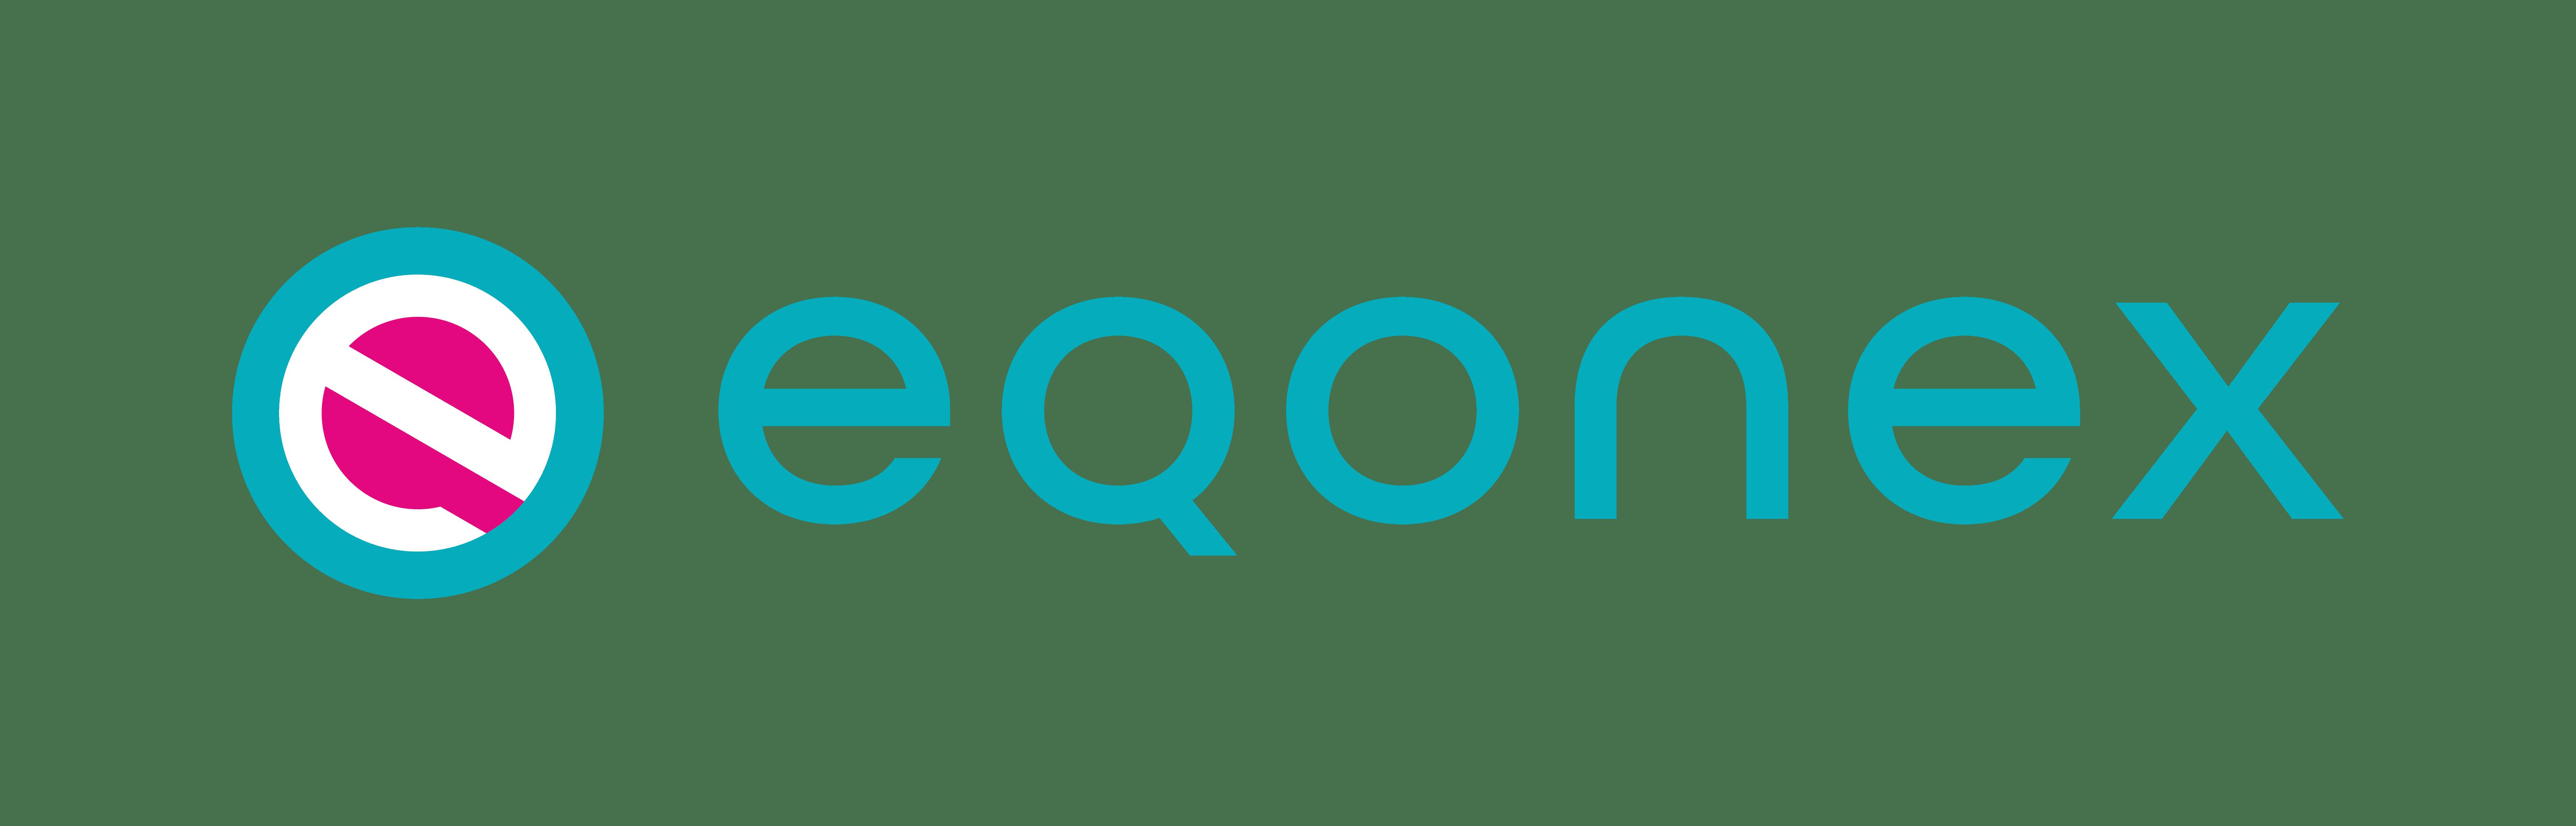 EQONEX logo